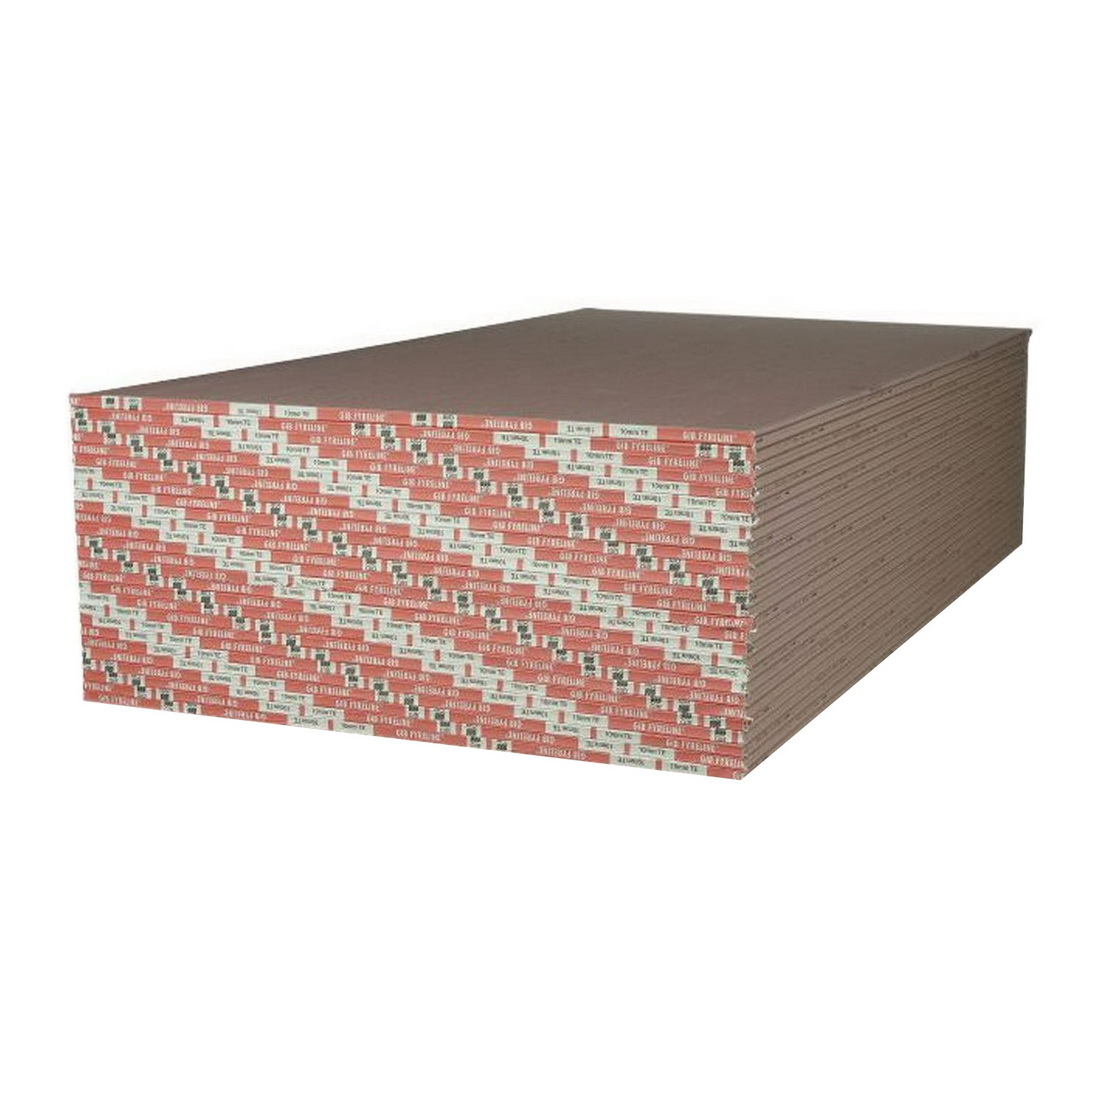 Fyreline Plasterboard 3000 x 1200 x 16mm 11568